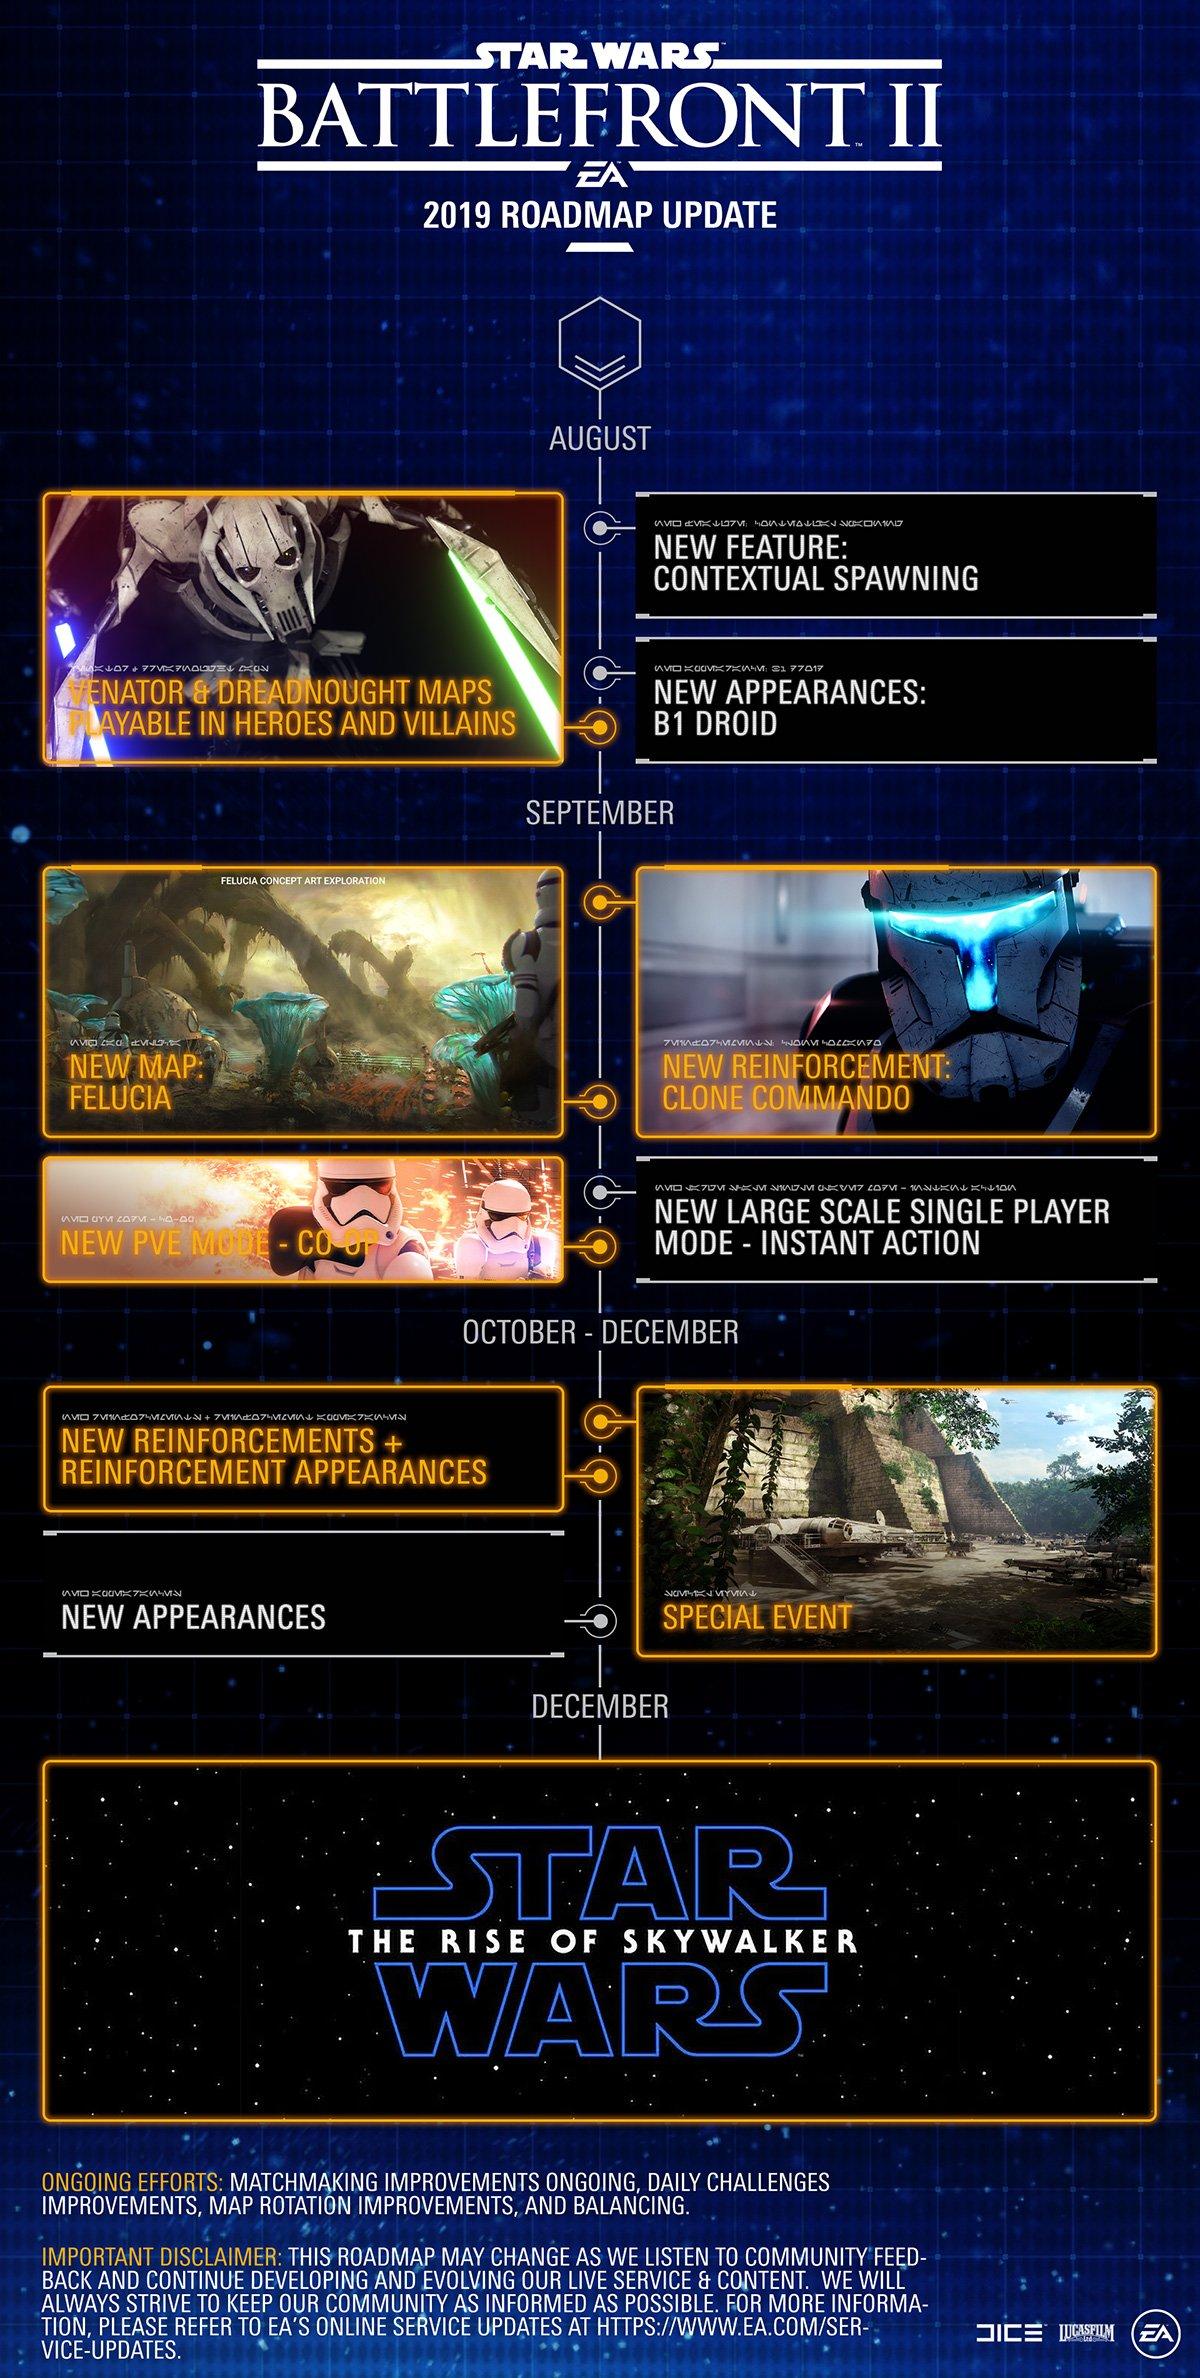 Star Wars Battlefront 2 خارطة الطريق